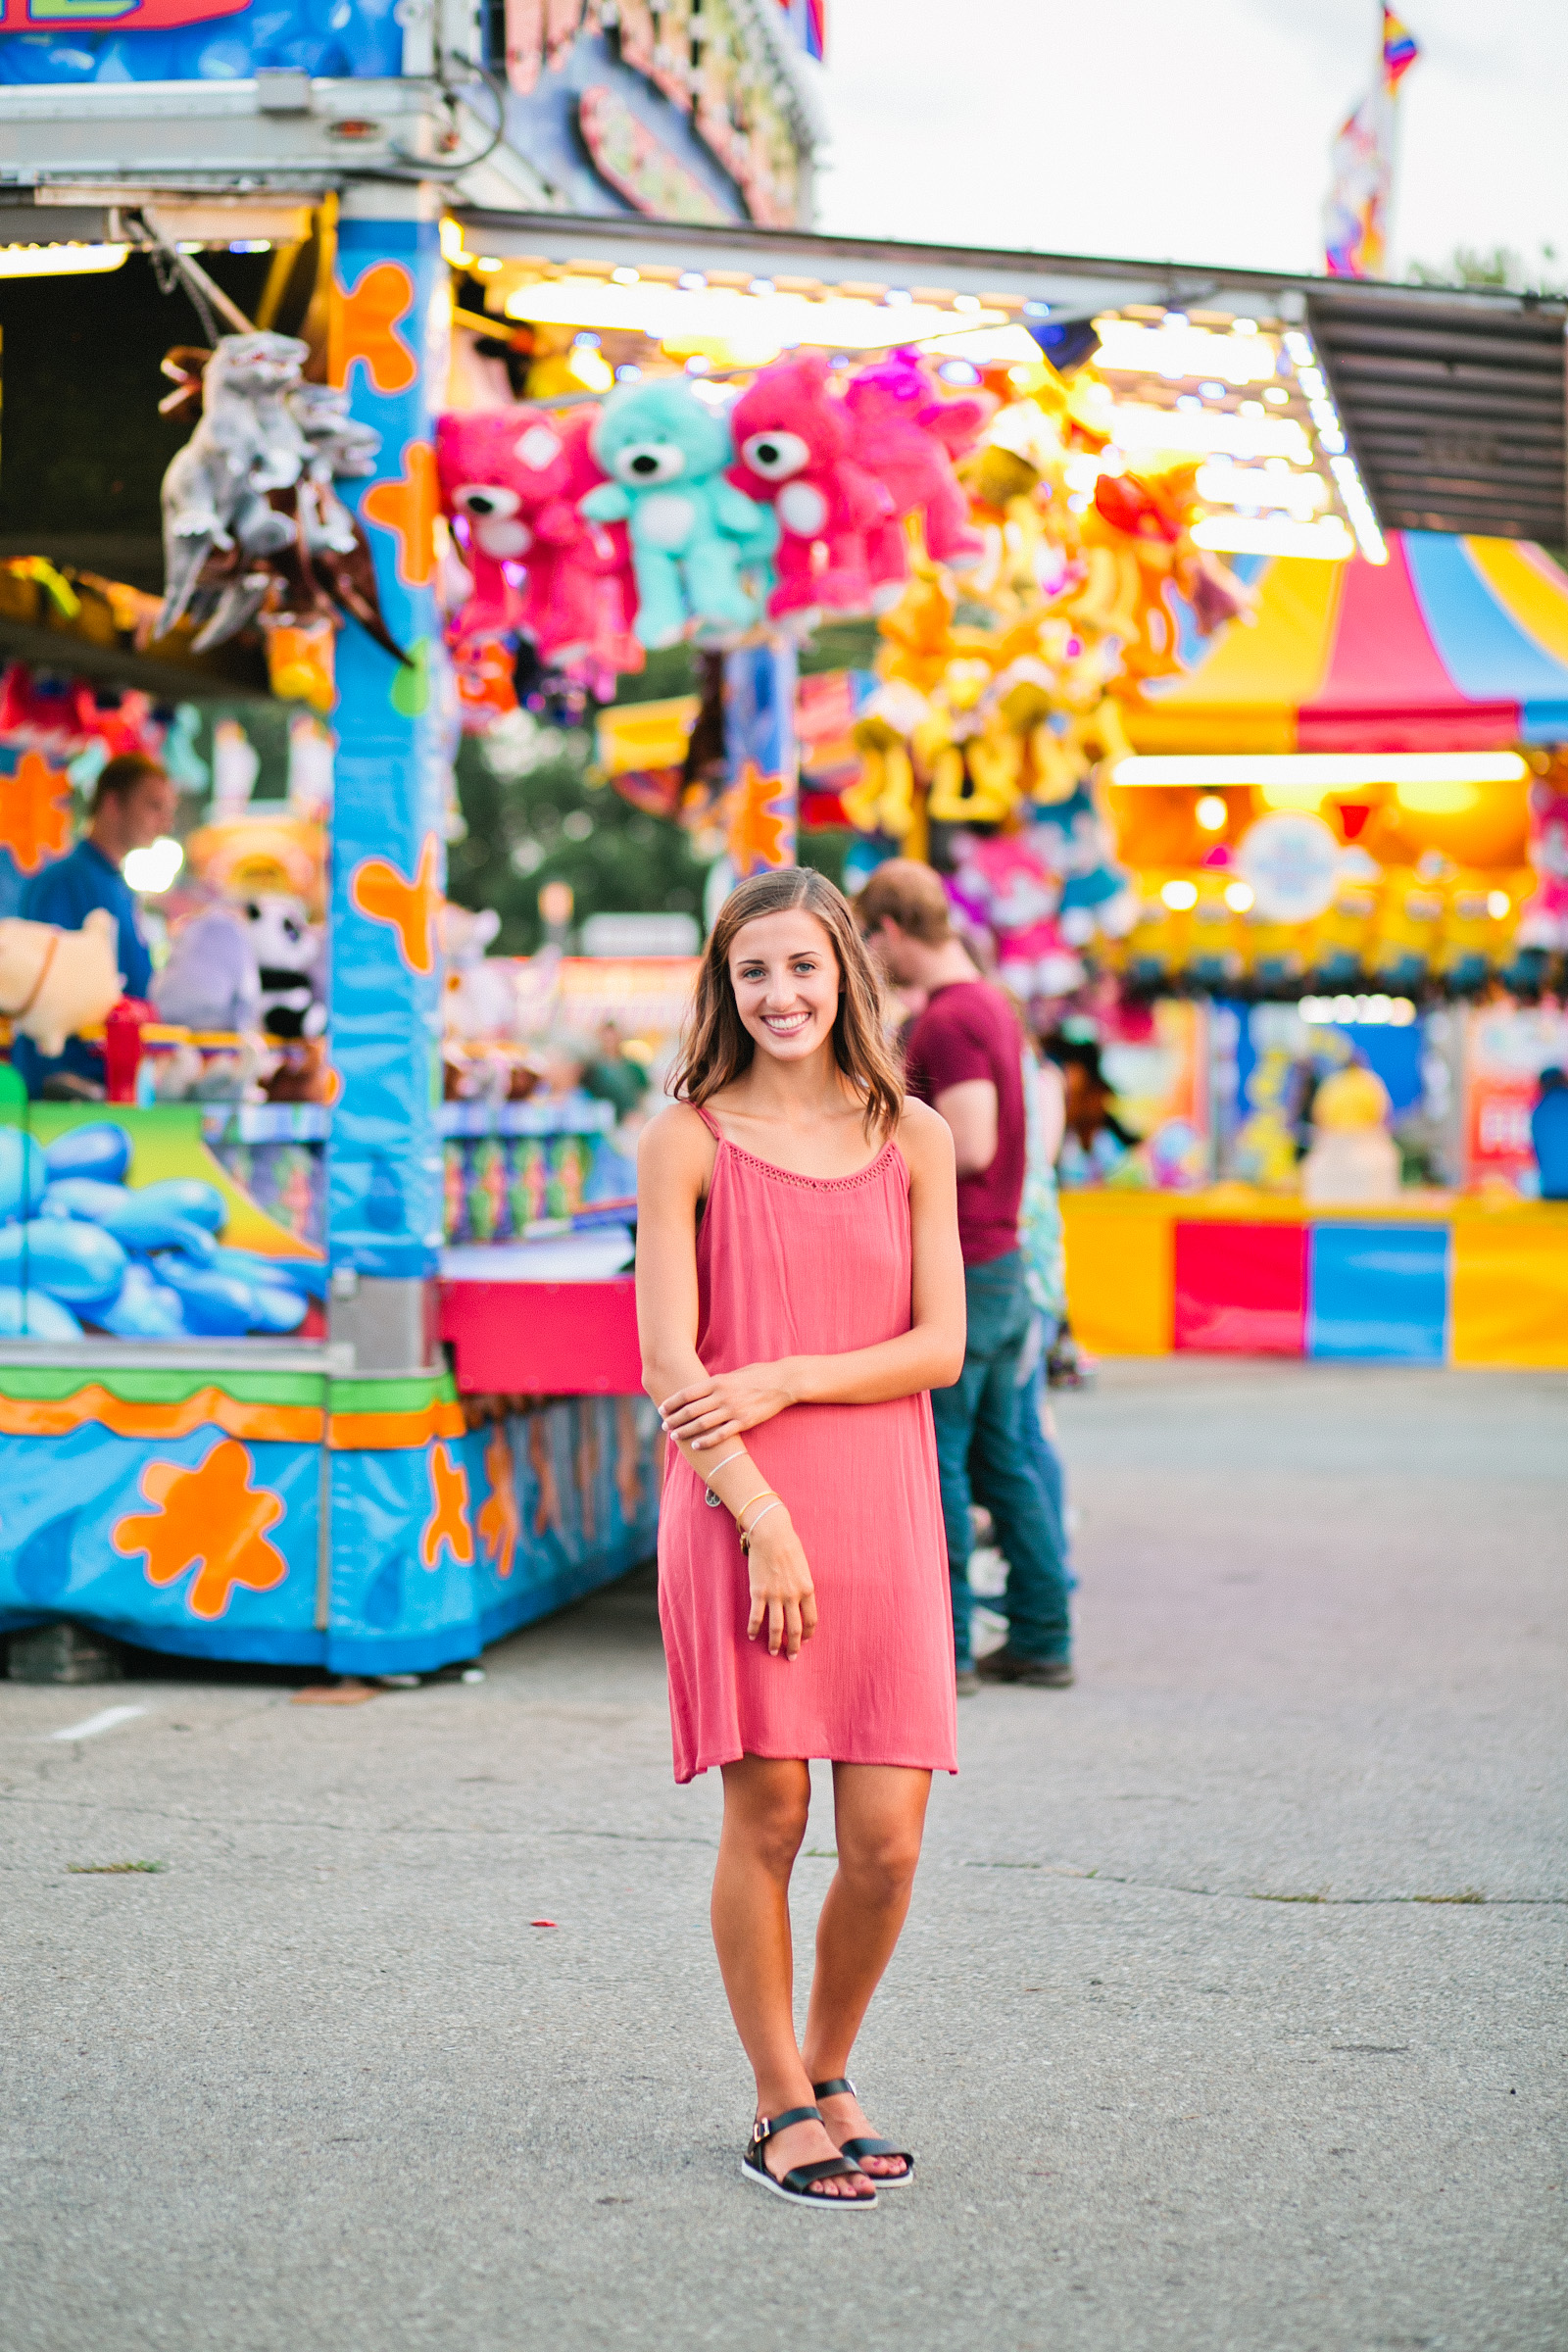 iowa state fair 2019 dates grandstand concerts